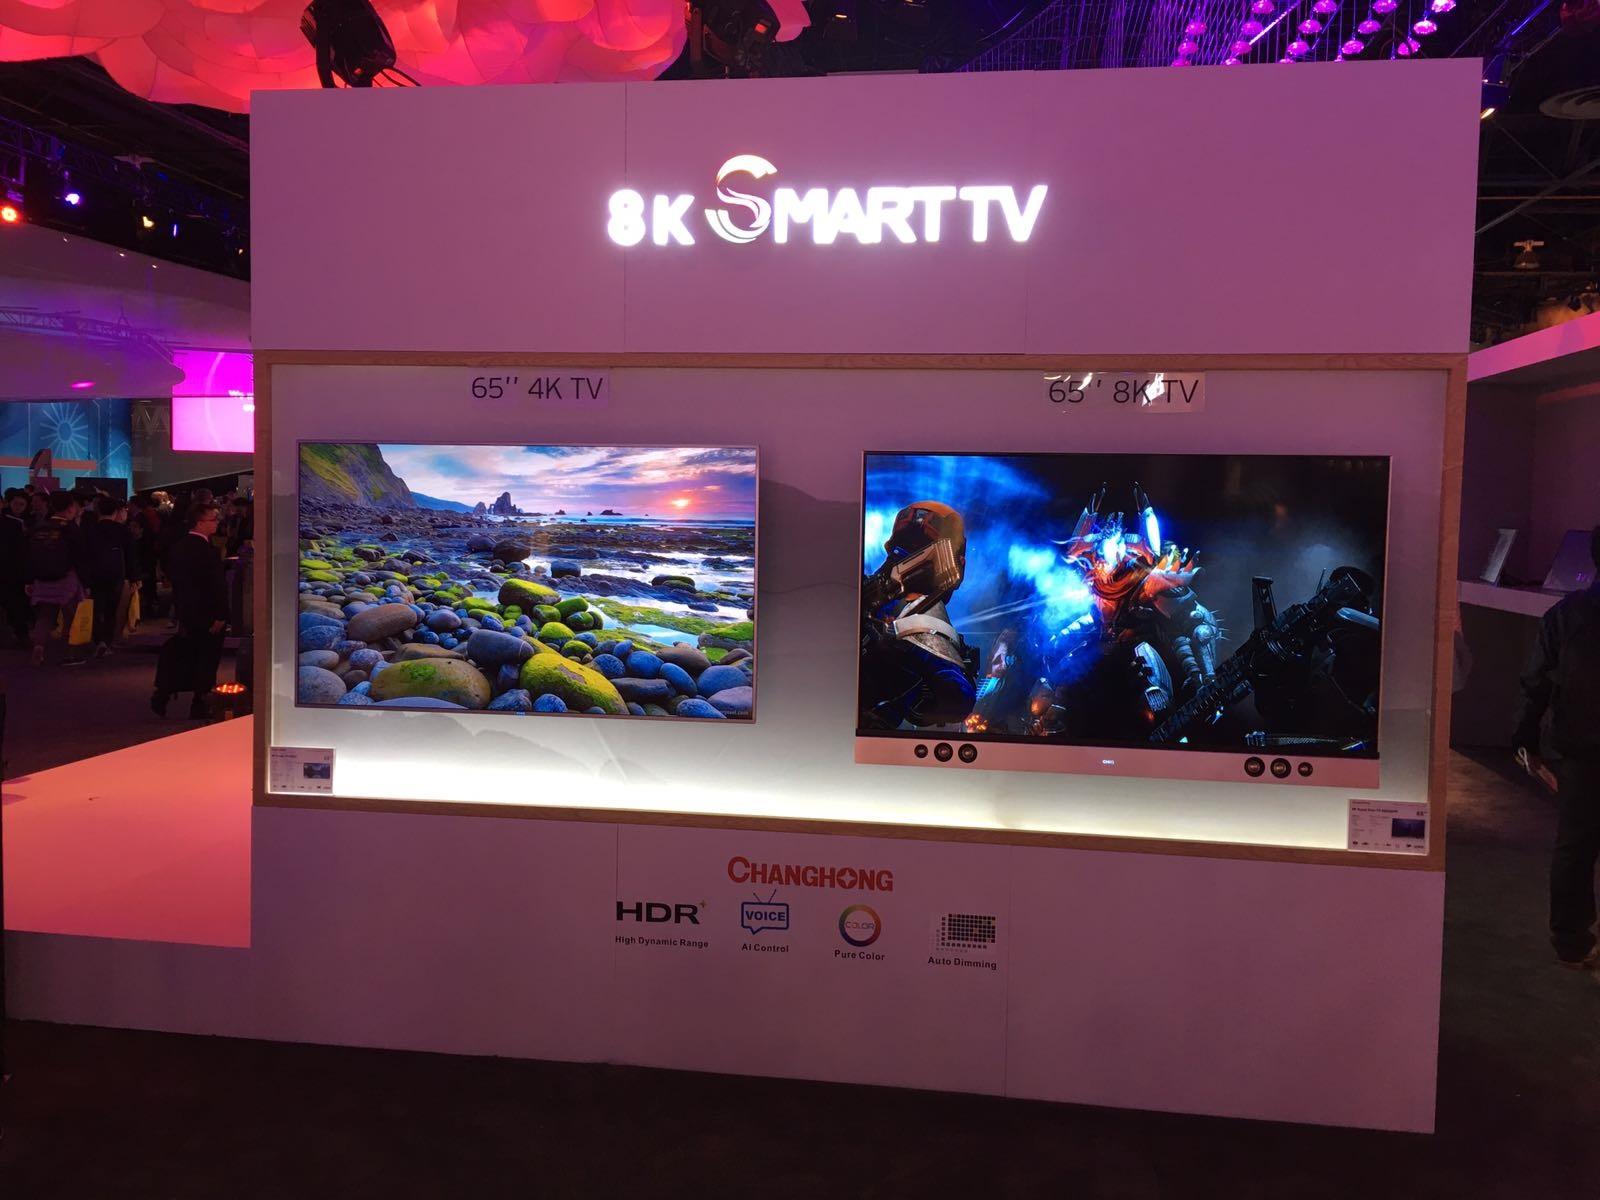 8K Smart TV Changhong; chytrá TV; CES 2017